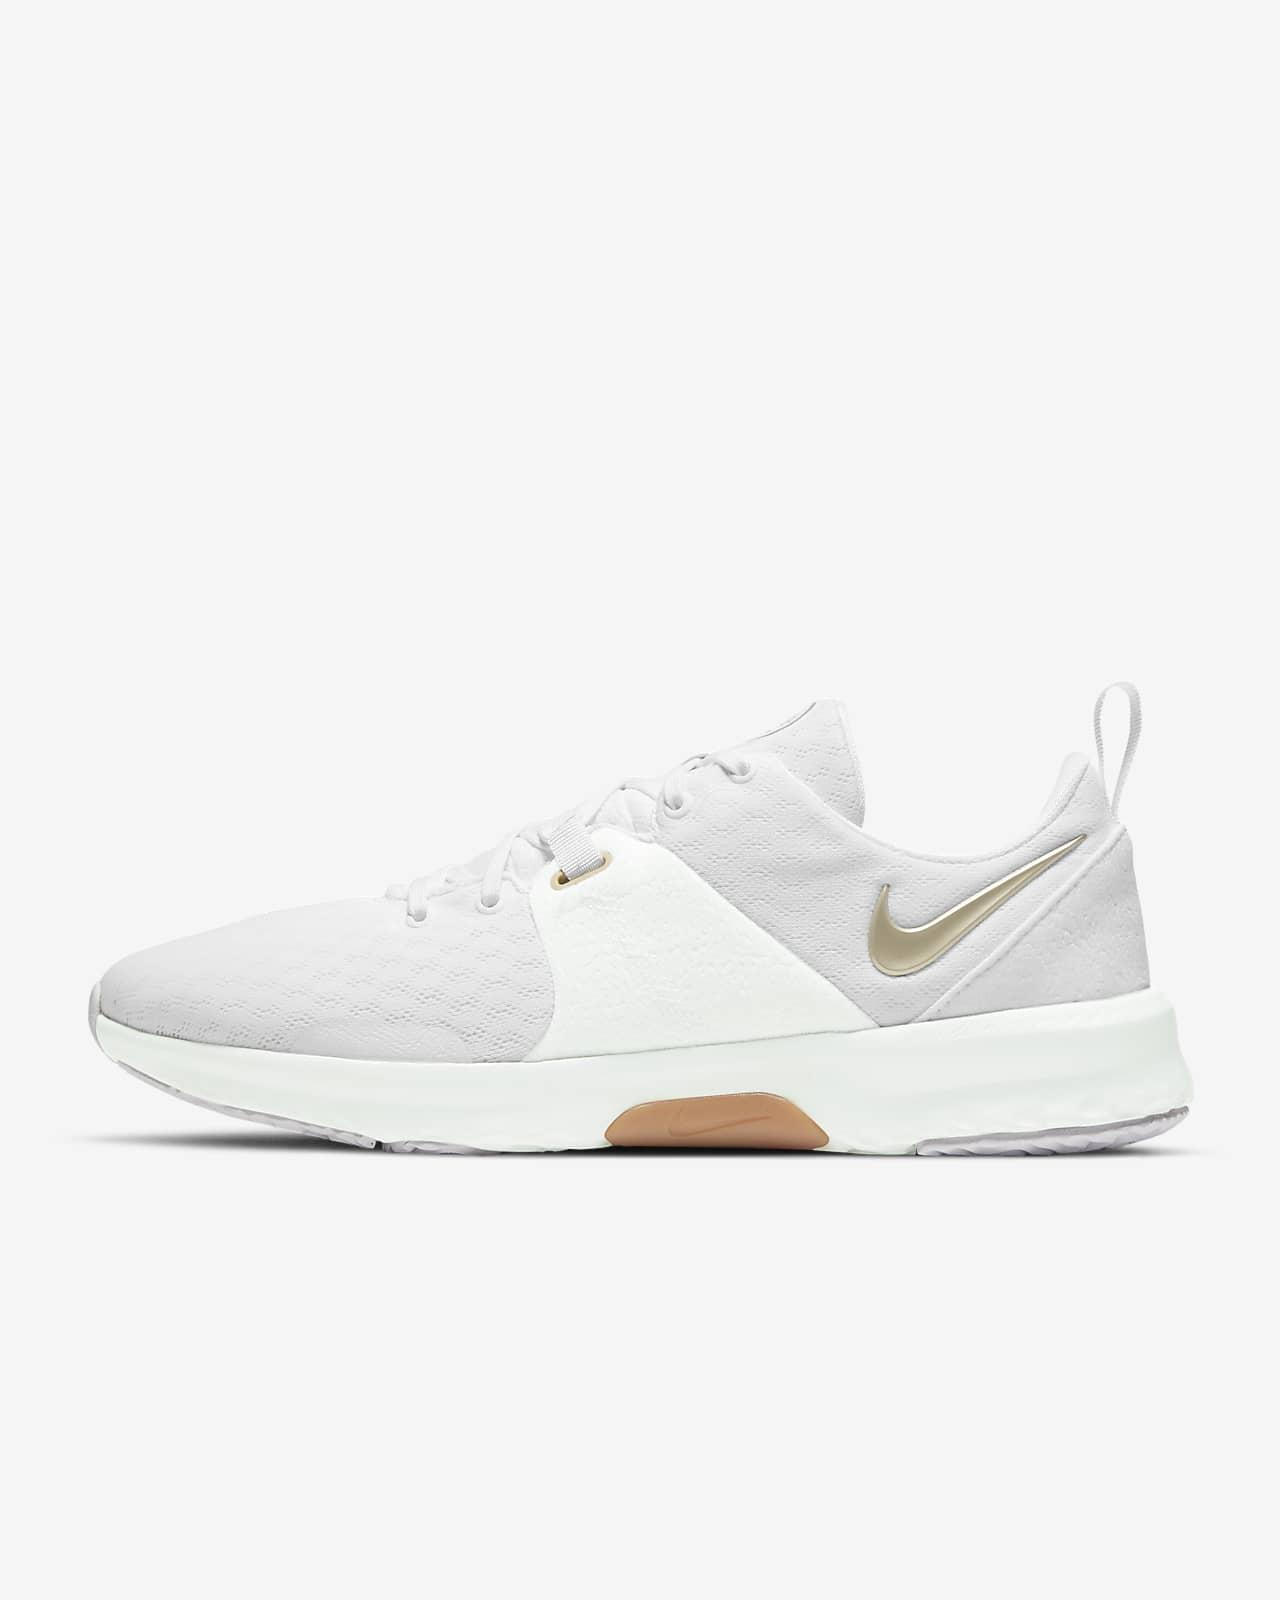 Nike City Trainer 3 Women's Training Shoe